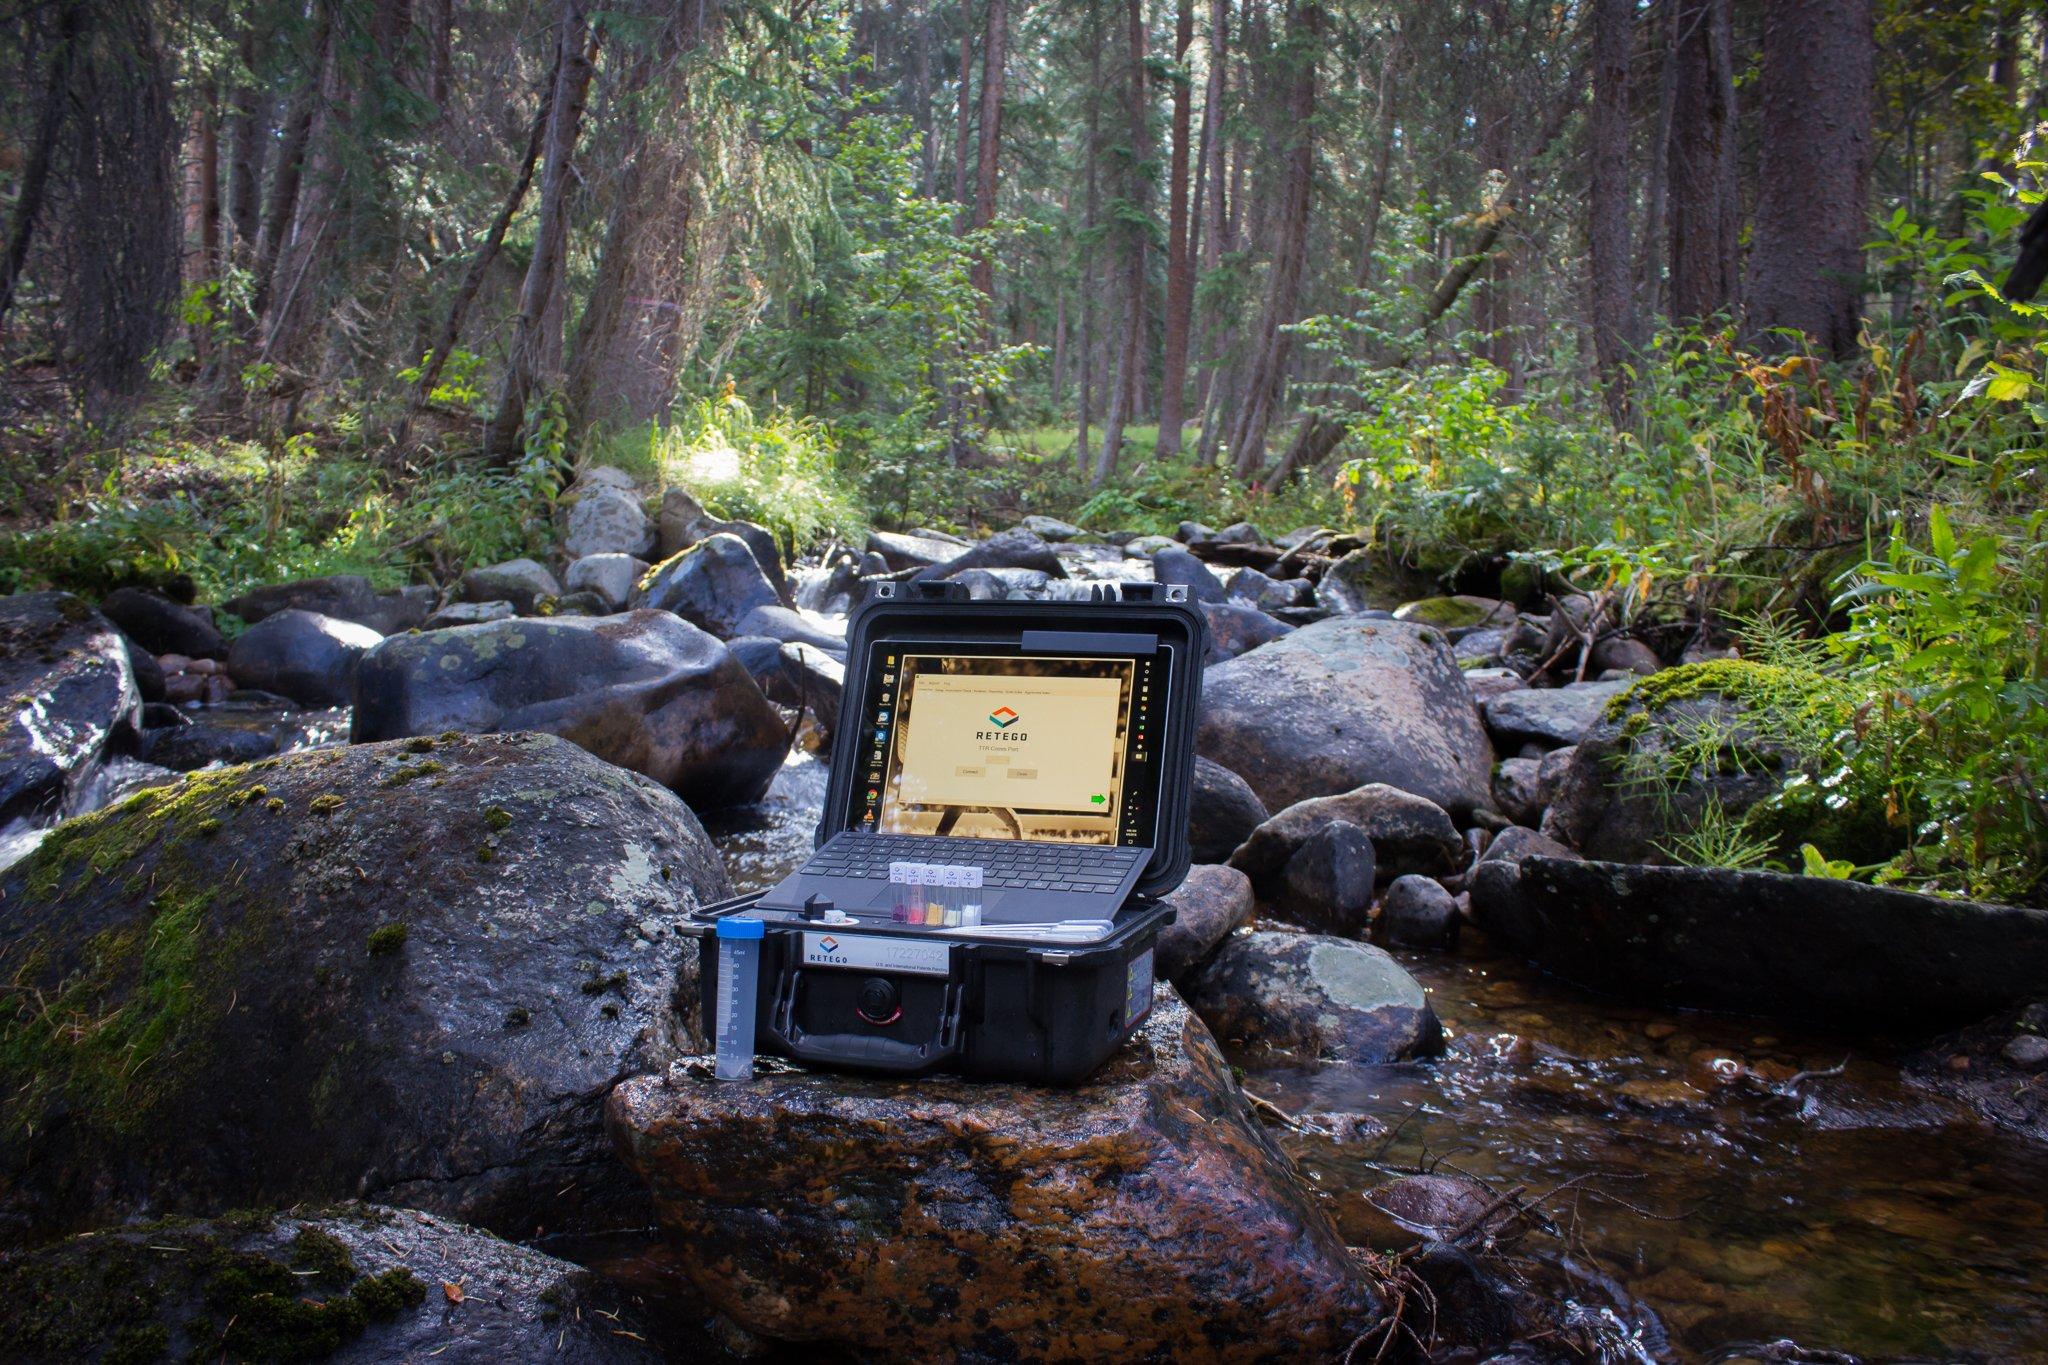 surface water testing - RETEGO